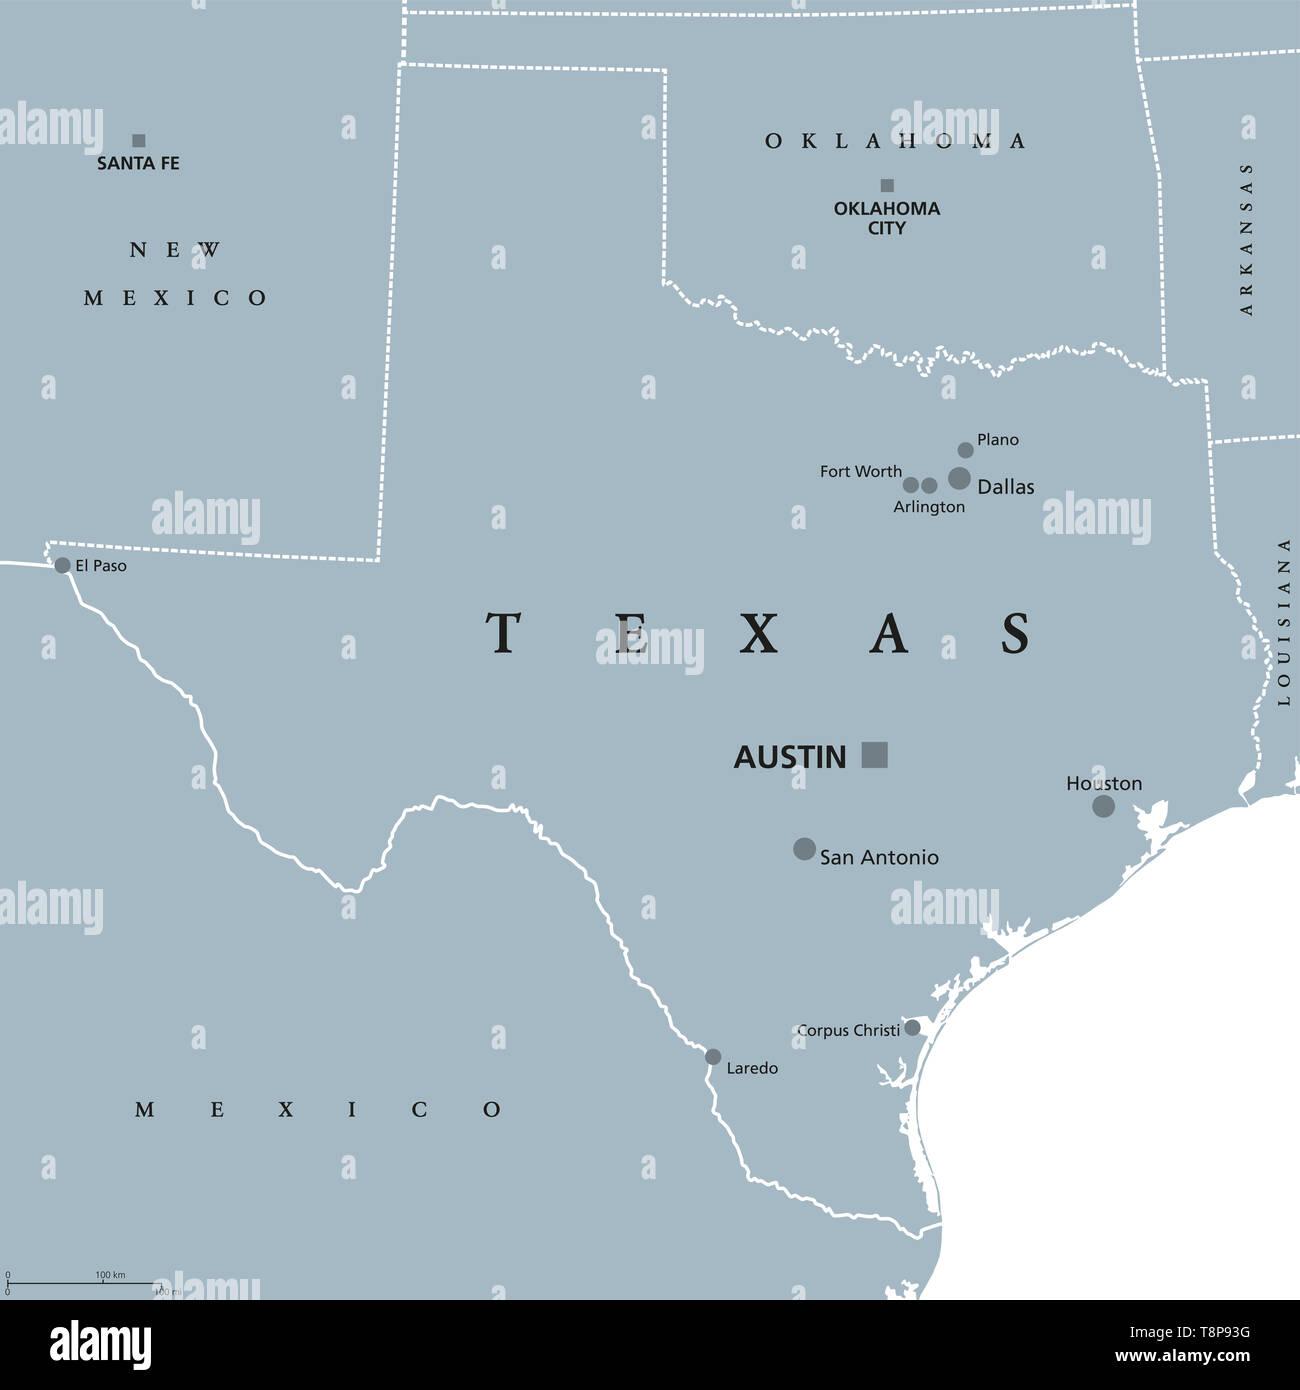 Texas political map with capital Austin. State in the South ... on texas austin, fox news austin, halloween austin,